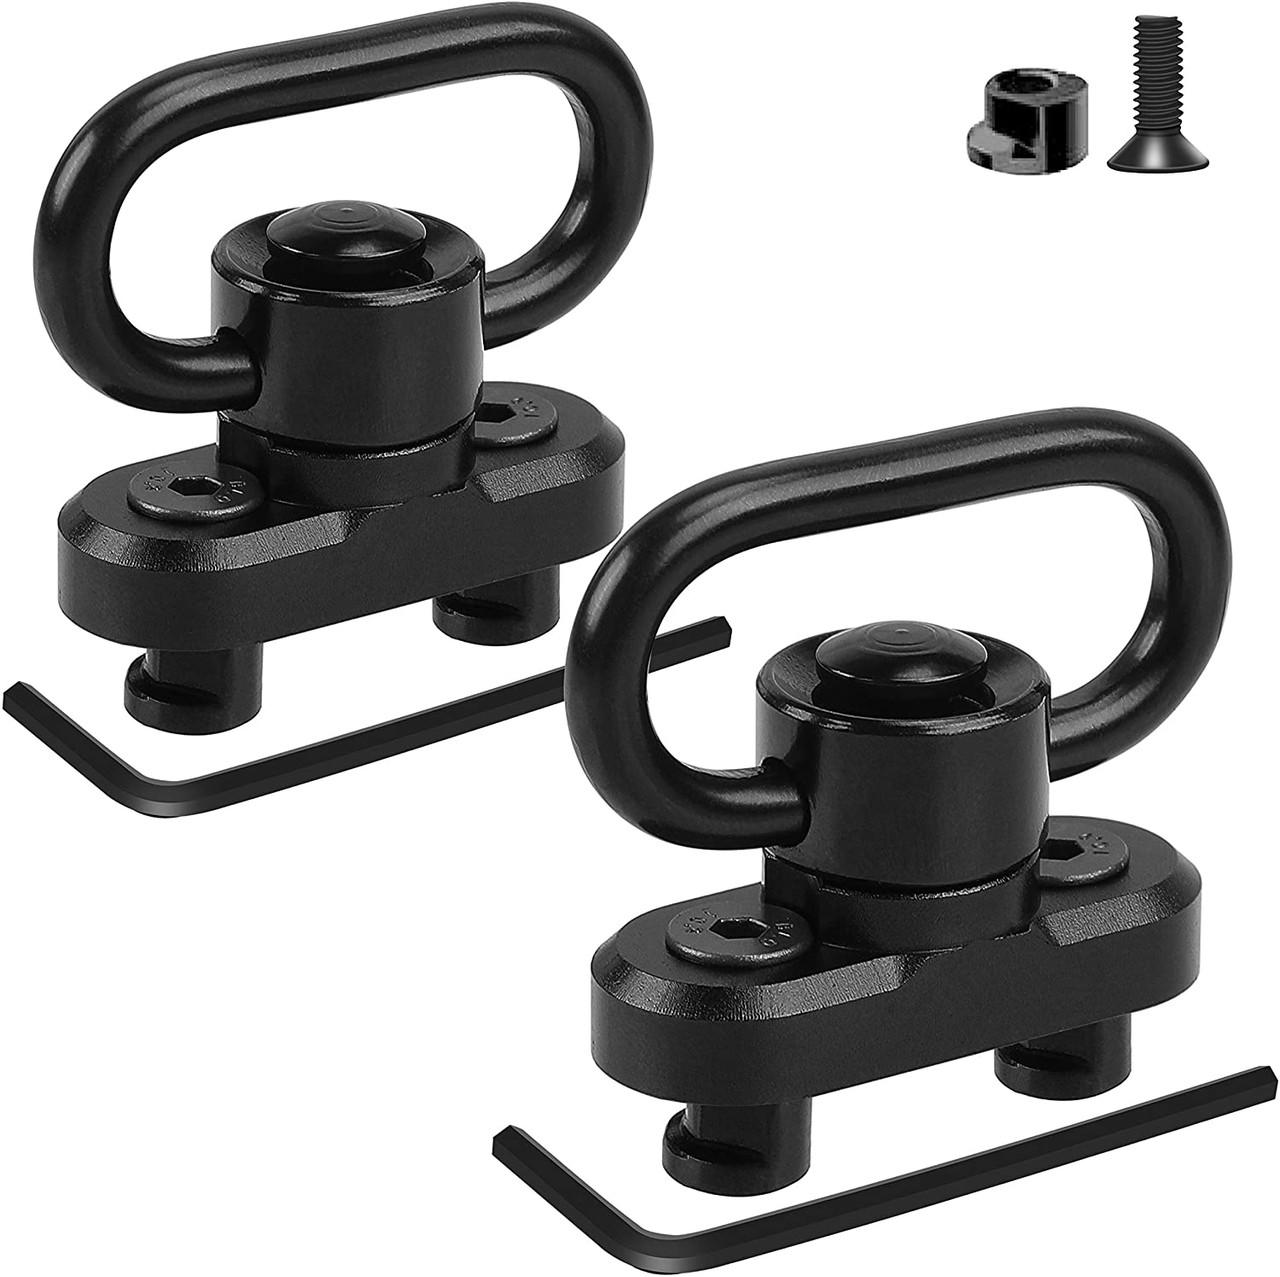 Low Profile KeyMod QD Quick Detach Sling Swivel Mount Aluminum 2 Slots Adapter